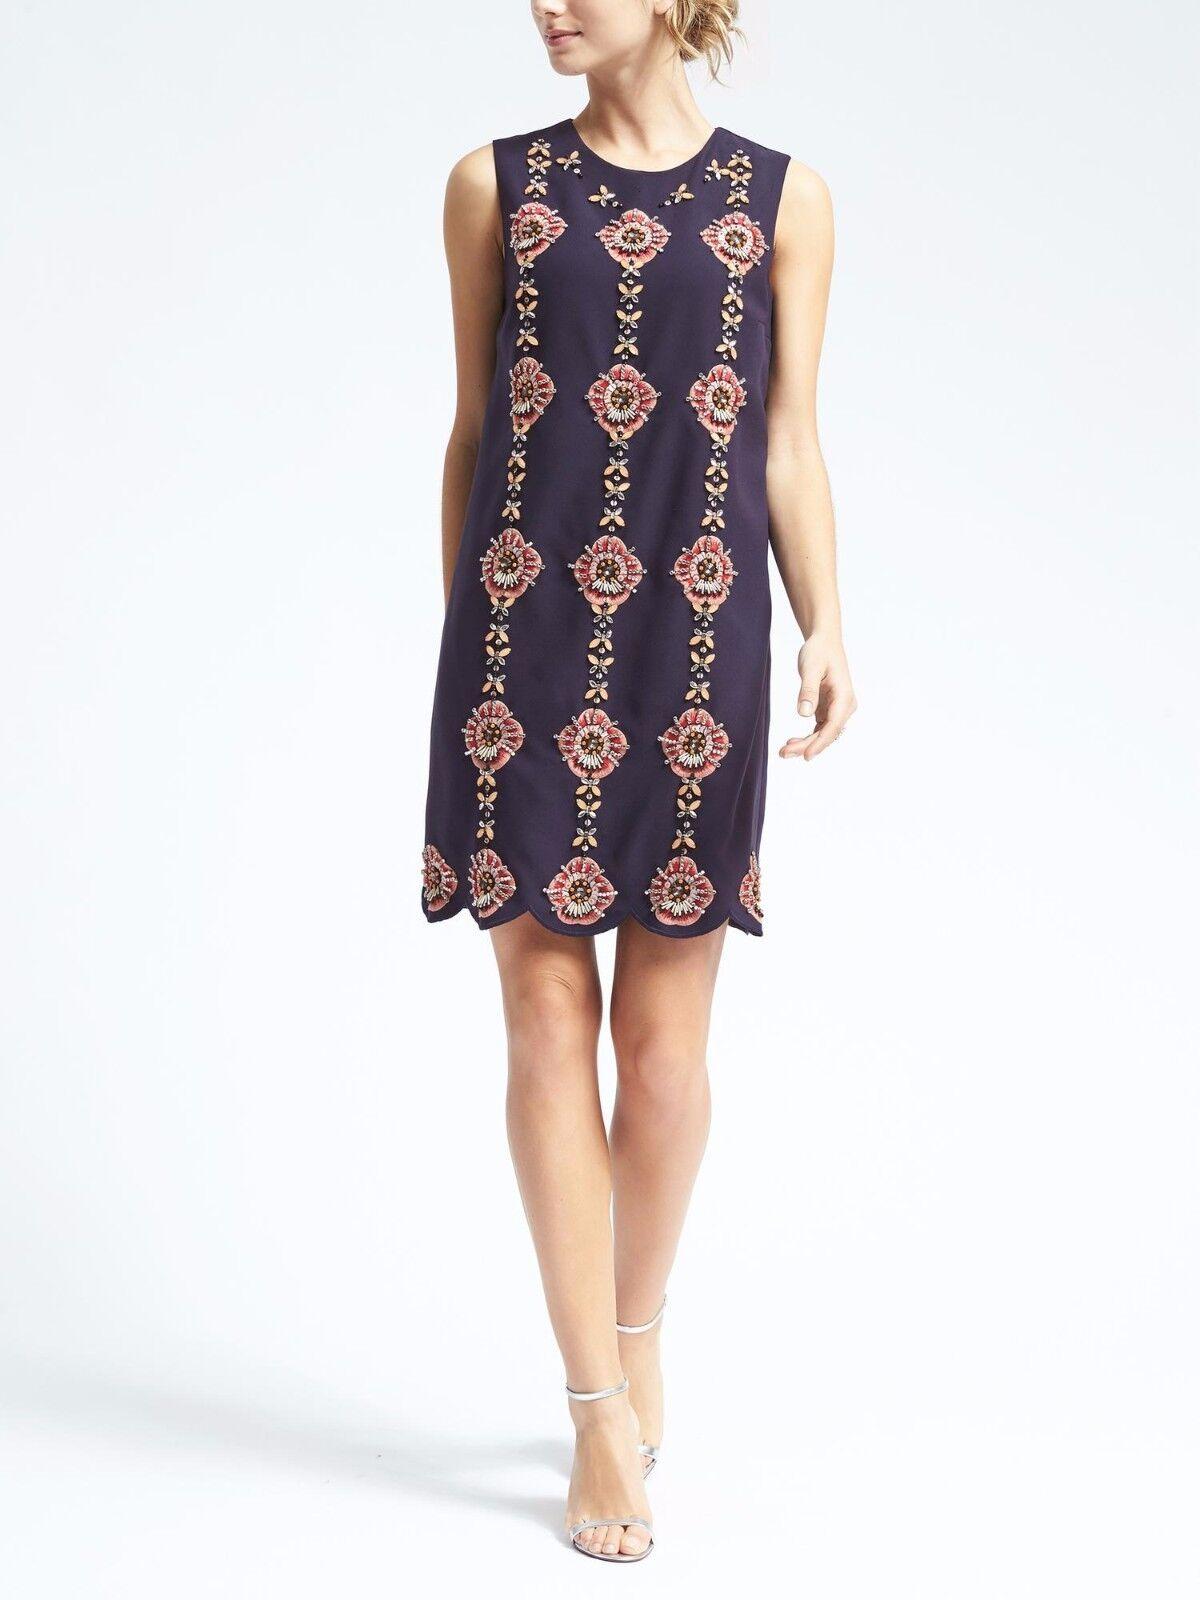 NWT BANANA REPUBLIC Embellished Shift Dress, Navy  Größe M       v1124